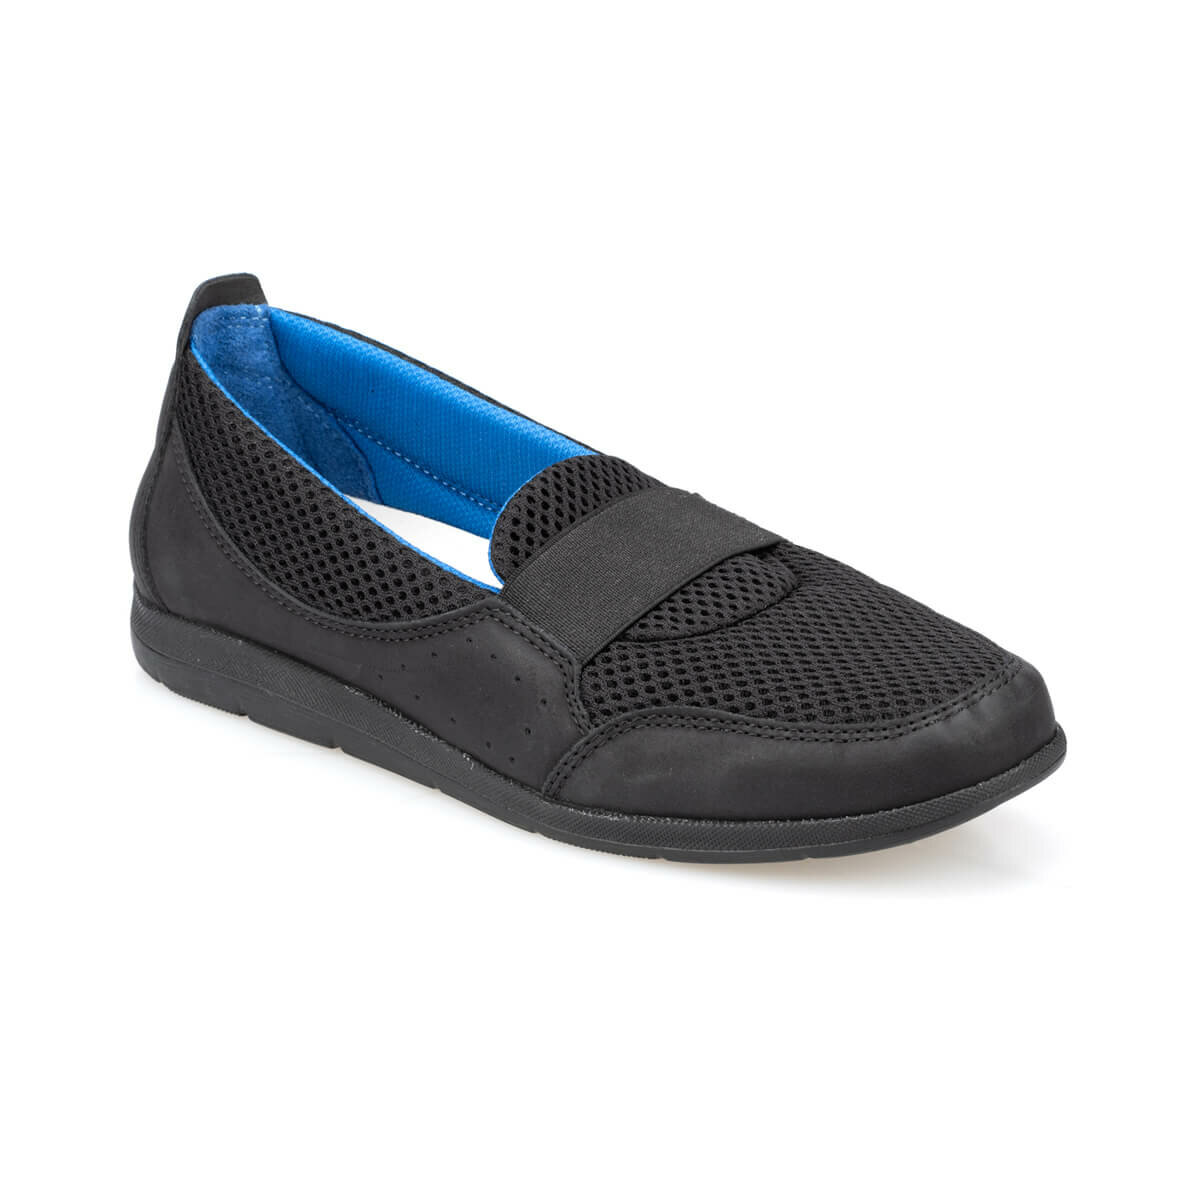 FLO 91. 111250.Z Black Women 'S Sneaker Shoes Polaris 5 Point